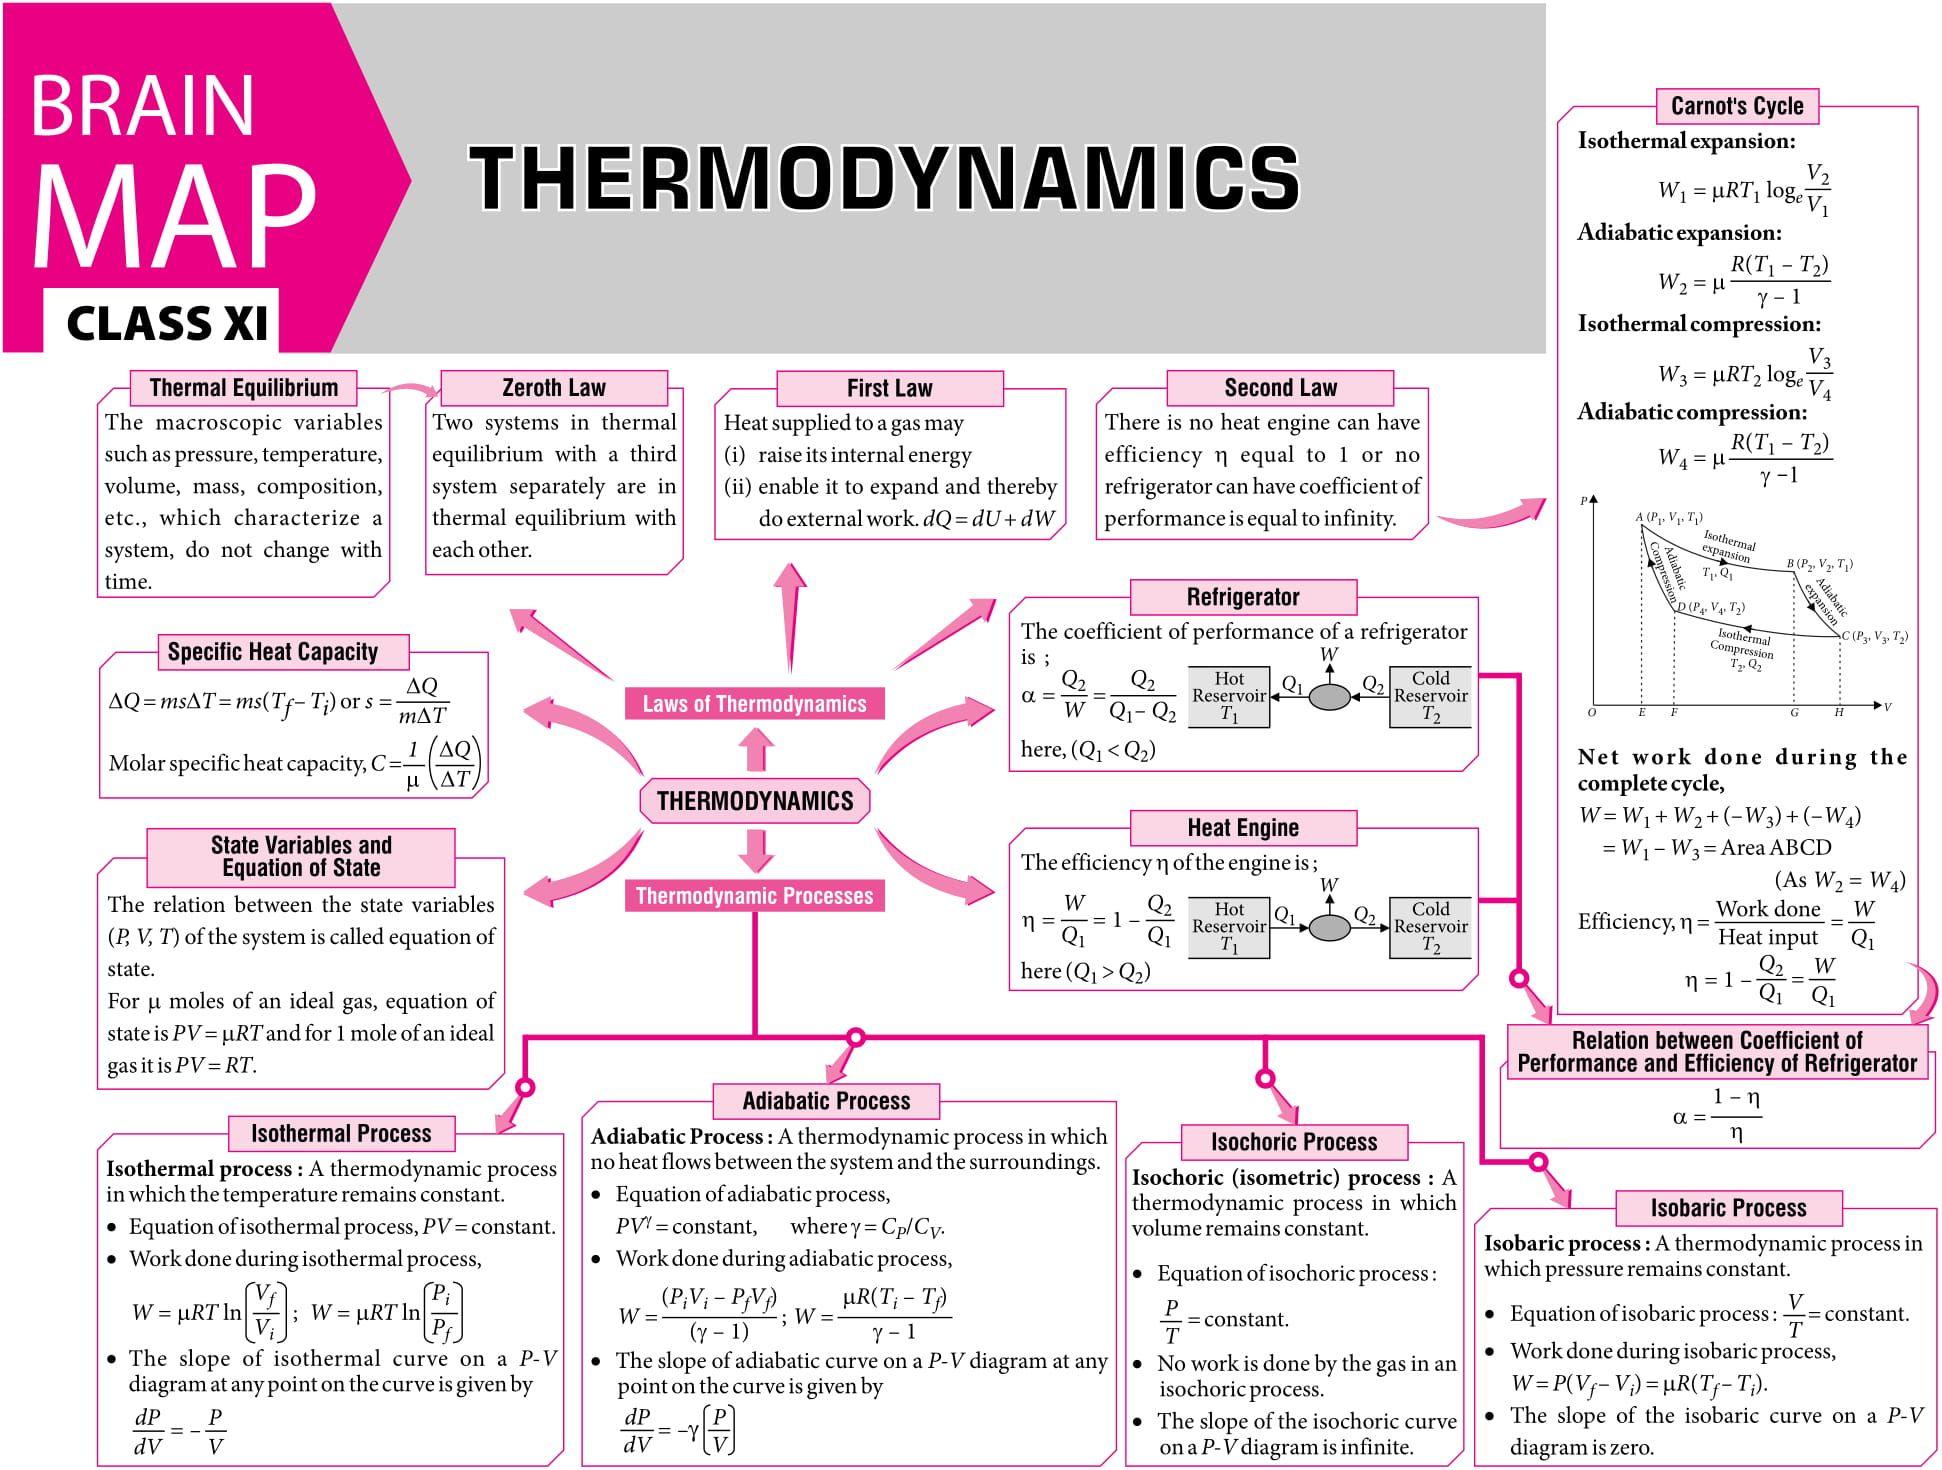 Thermodynamics Concept Map Mtg Physics For You Magazine Jeemain Jeeadvanced Class11 Clas Physics Notes Physics Classroom Physics And Mathematics